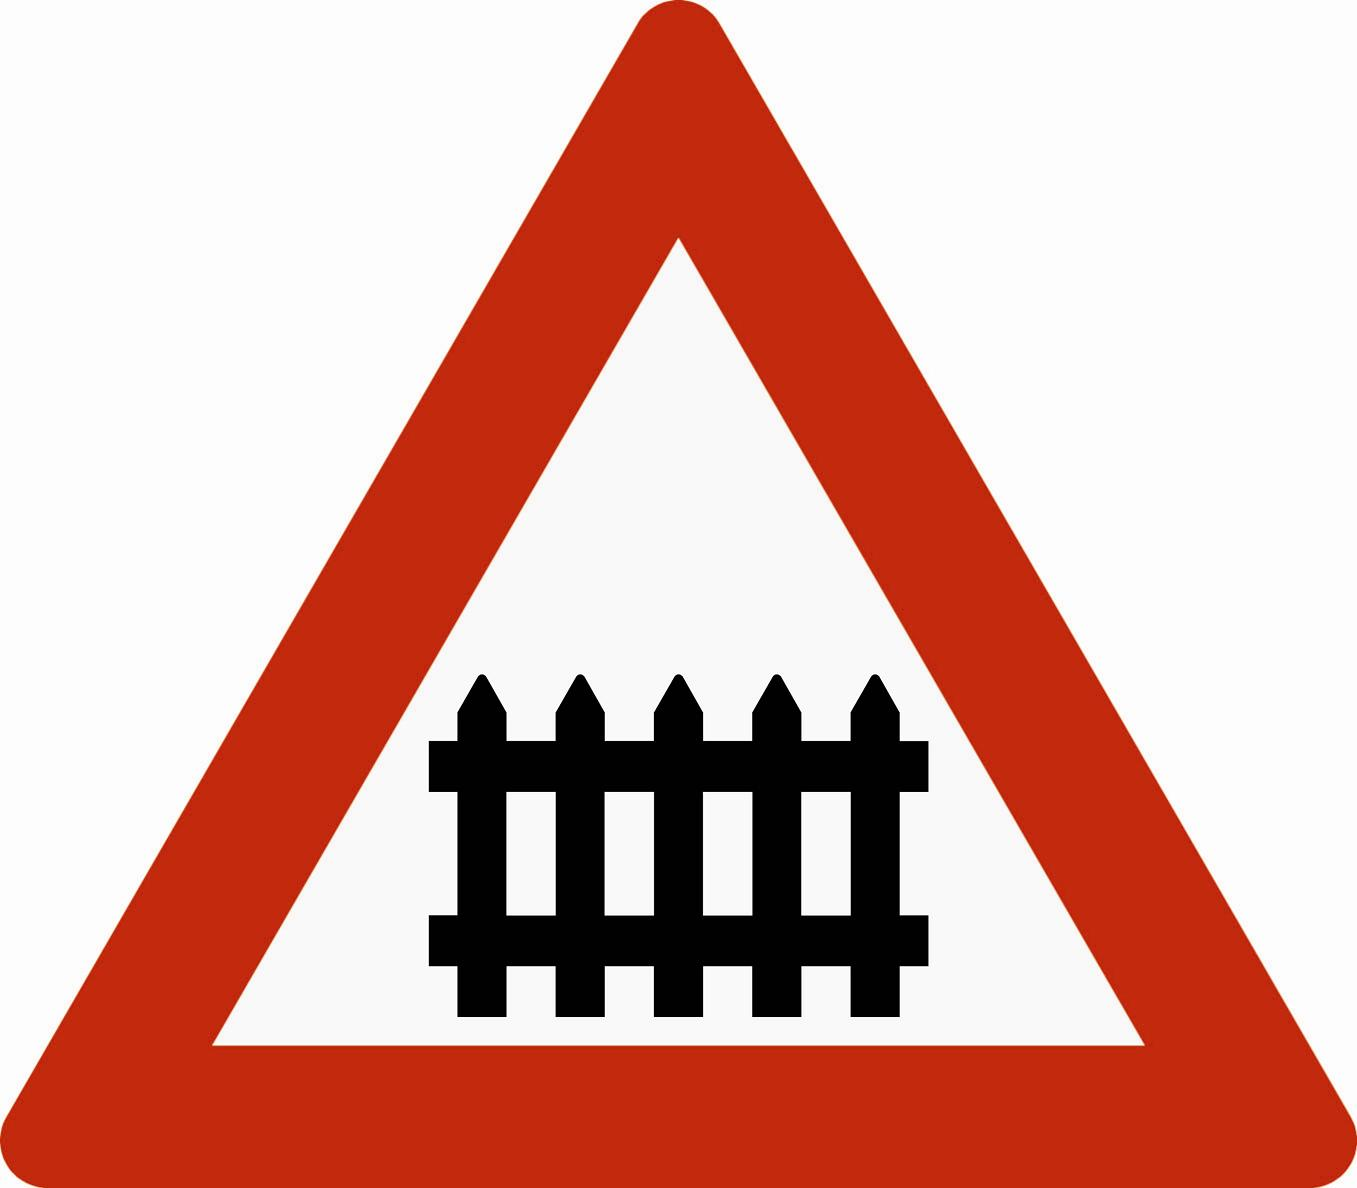 Advarsel Skilt Trafikkskilt No